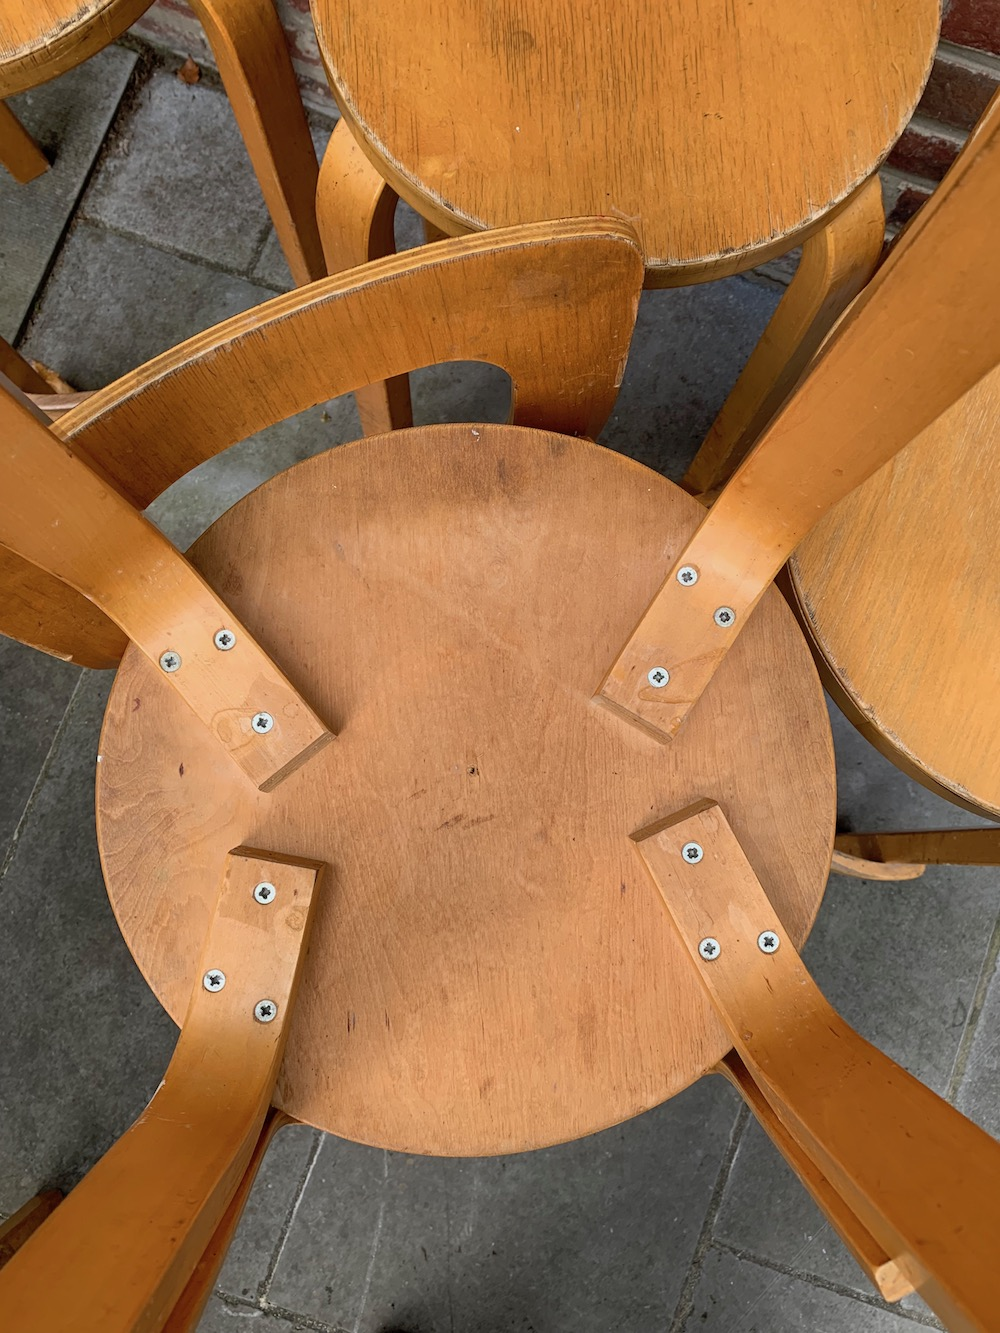 Alvar Aalto, tabouret, stool, Artek, danish design, scandinavian design, kitchen island, ilot central, décoration cuisine, tabouret cuisine, chaise vintage, vintage chair, wooden stool, tabouret bois, tabouret dossier